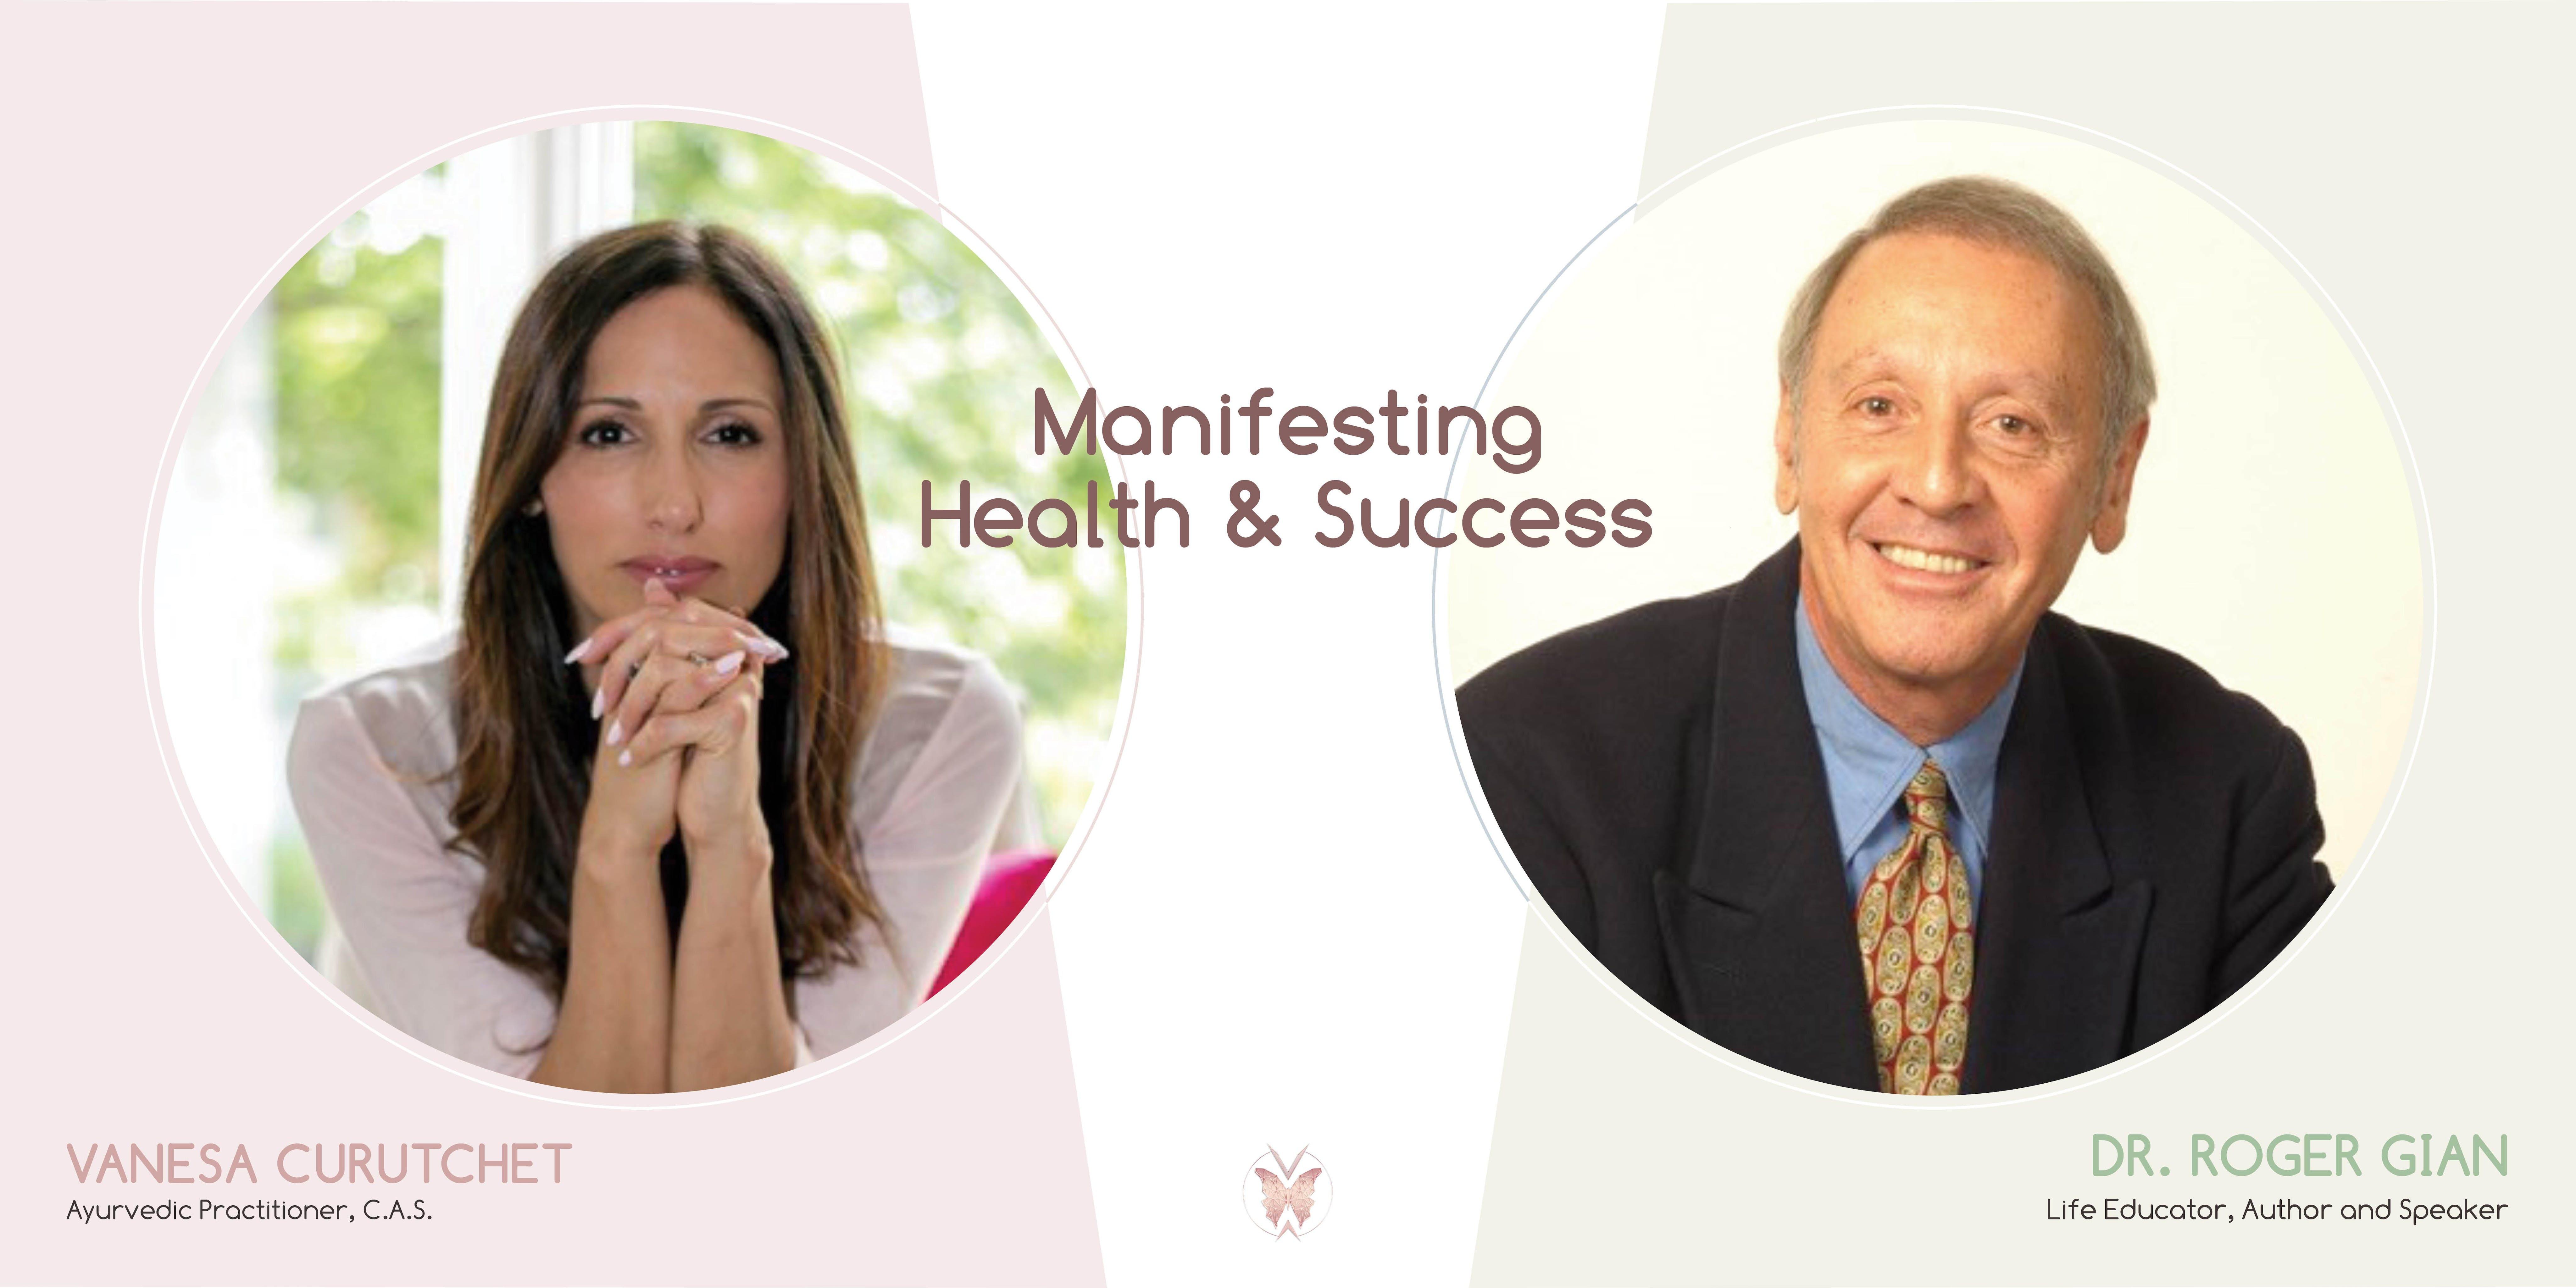 Manifesting Health & Wellness #4